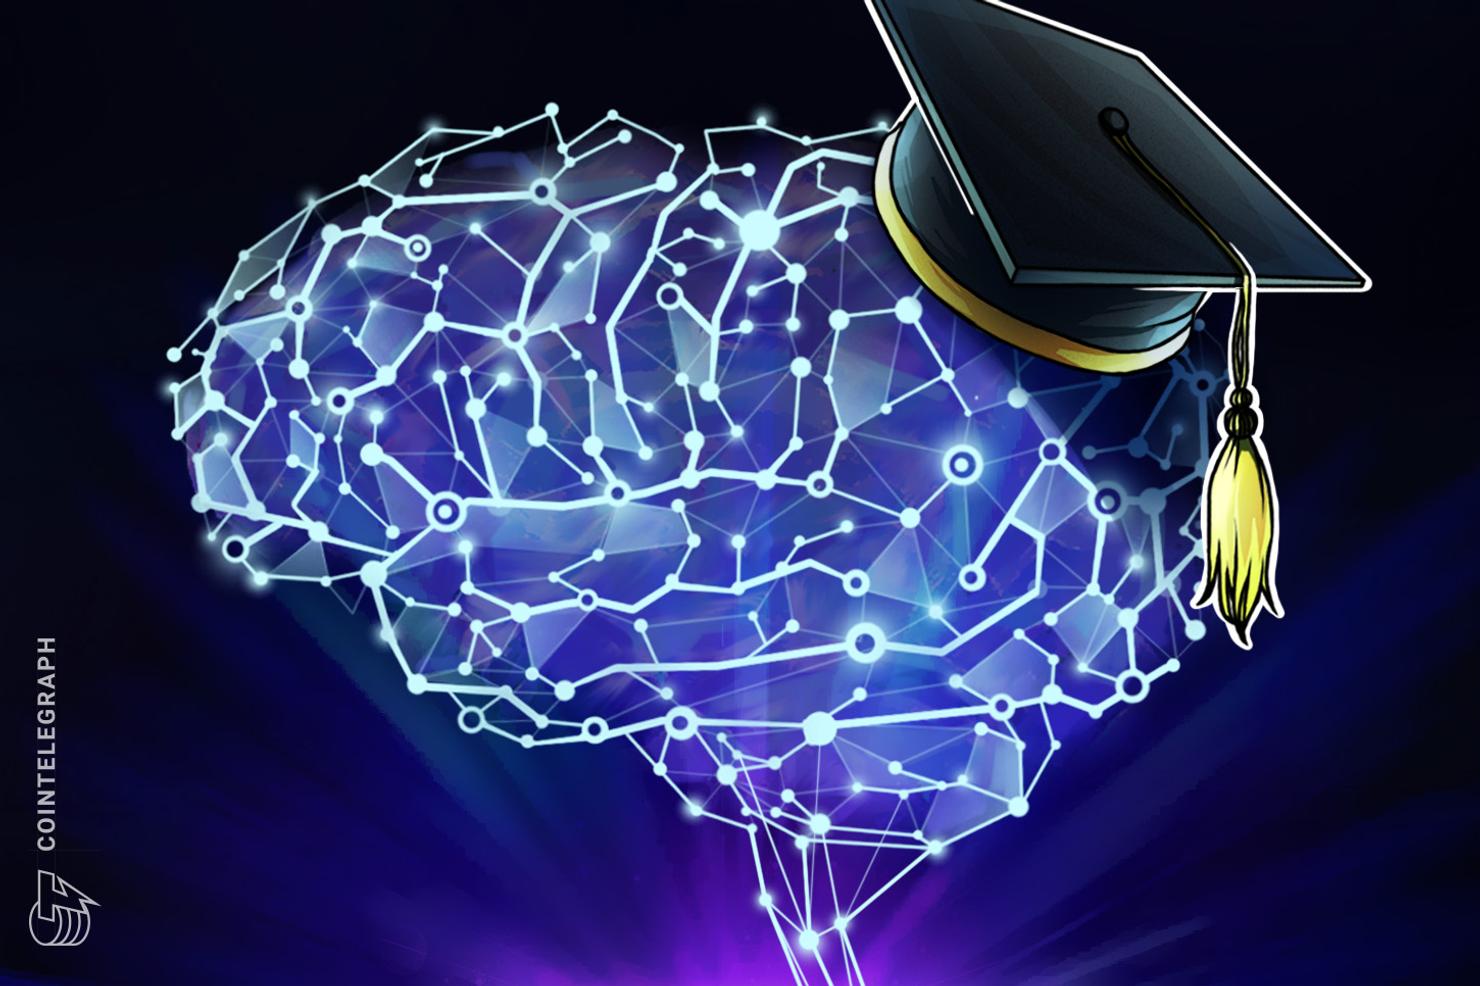 University of Malta Introduces Blockchain and DLT Master's Degree